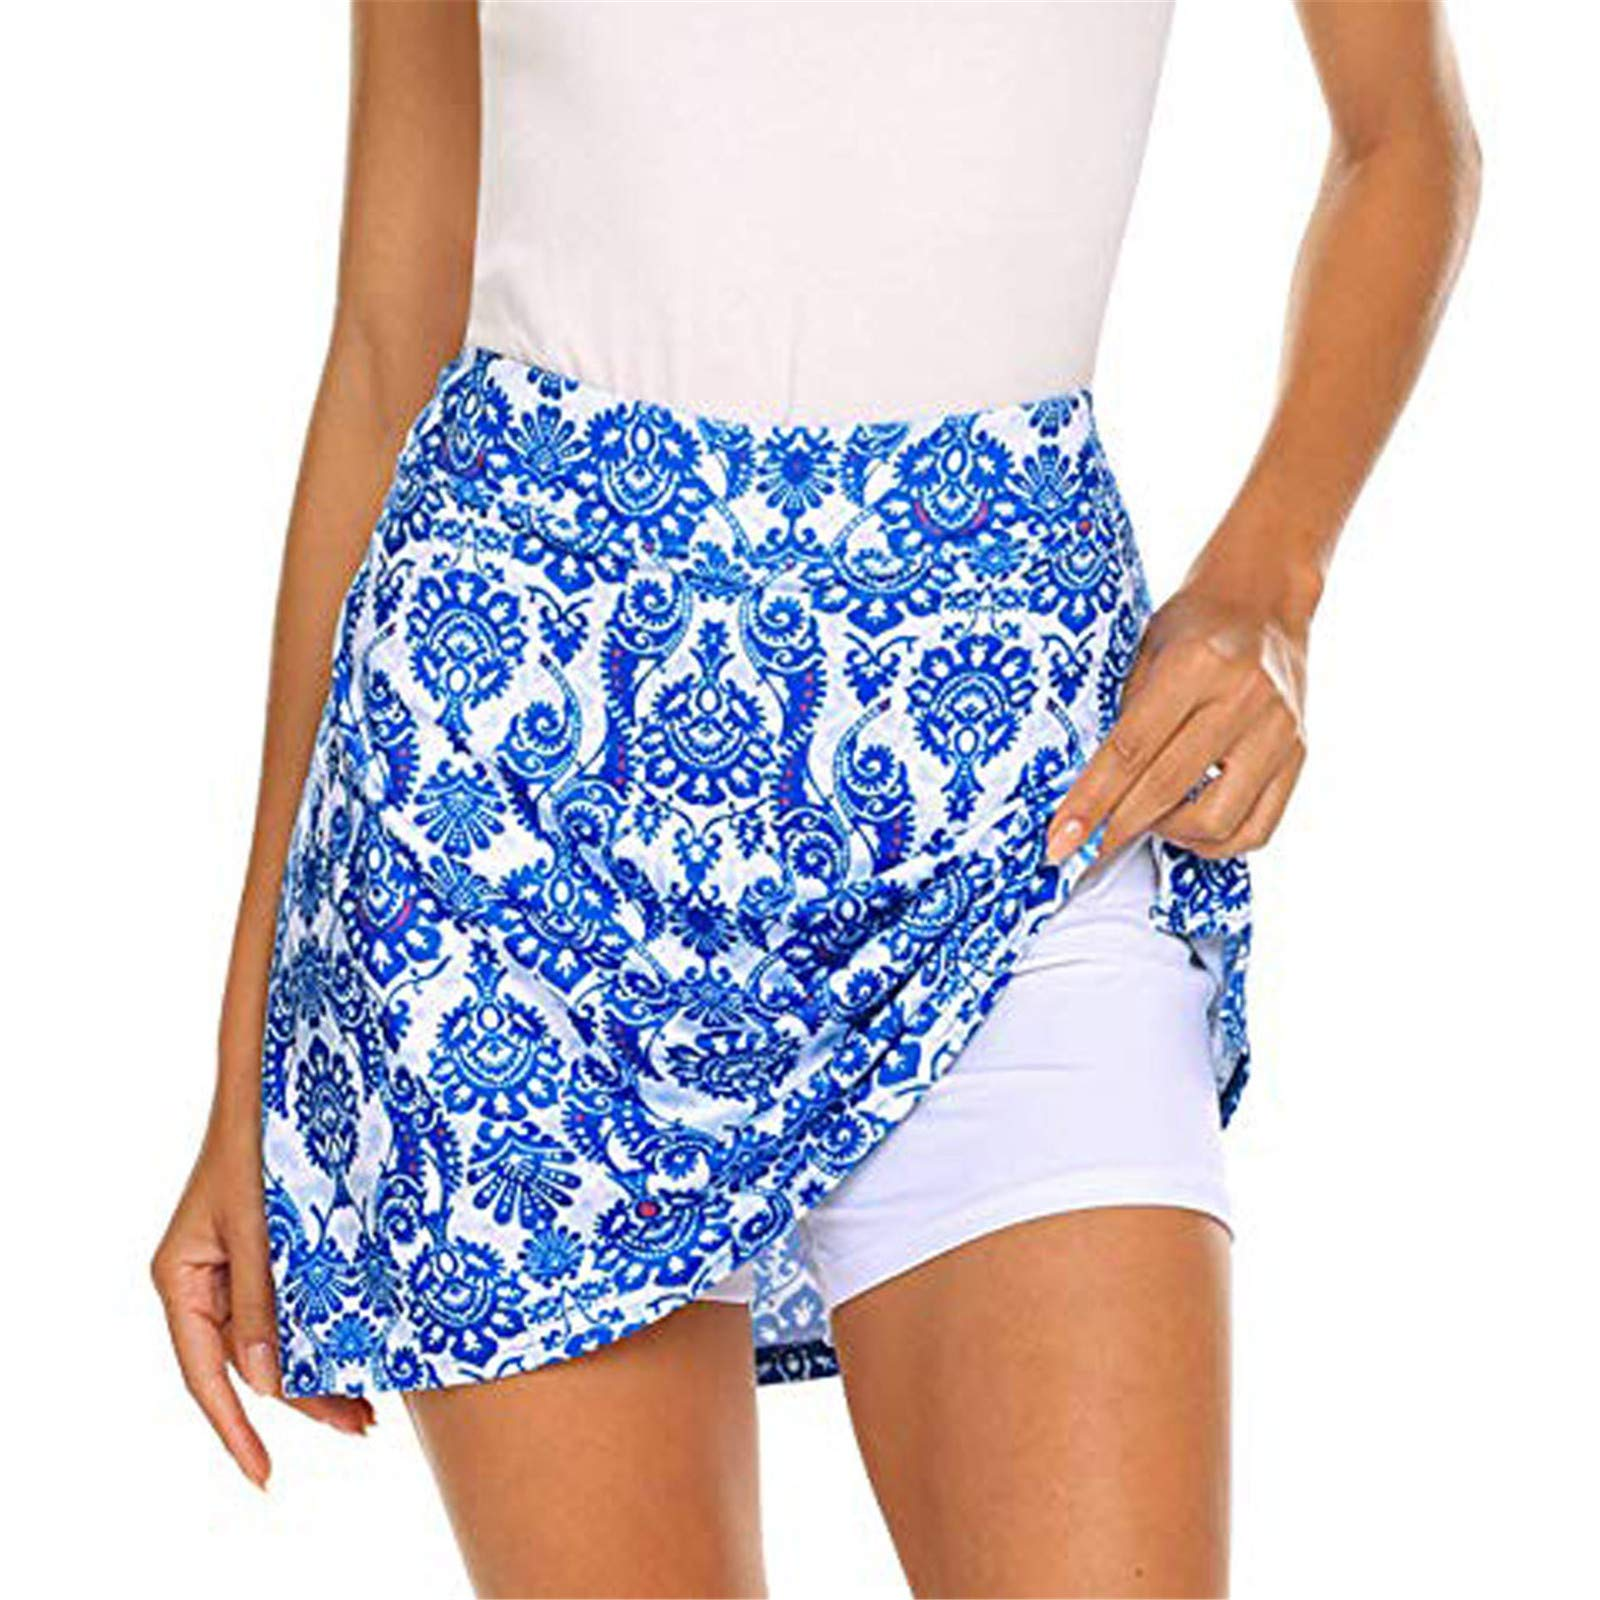 Thenxin Women's Active Skorts Running Tennis Golf Sports Lightweight Skirt Built in Shorts Pockets (White, S) by Thenxin